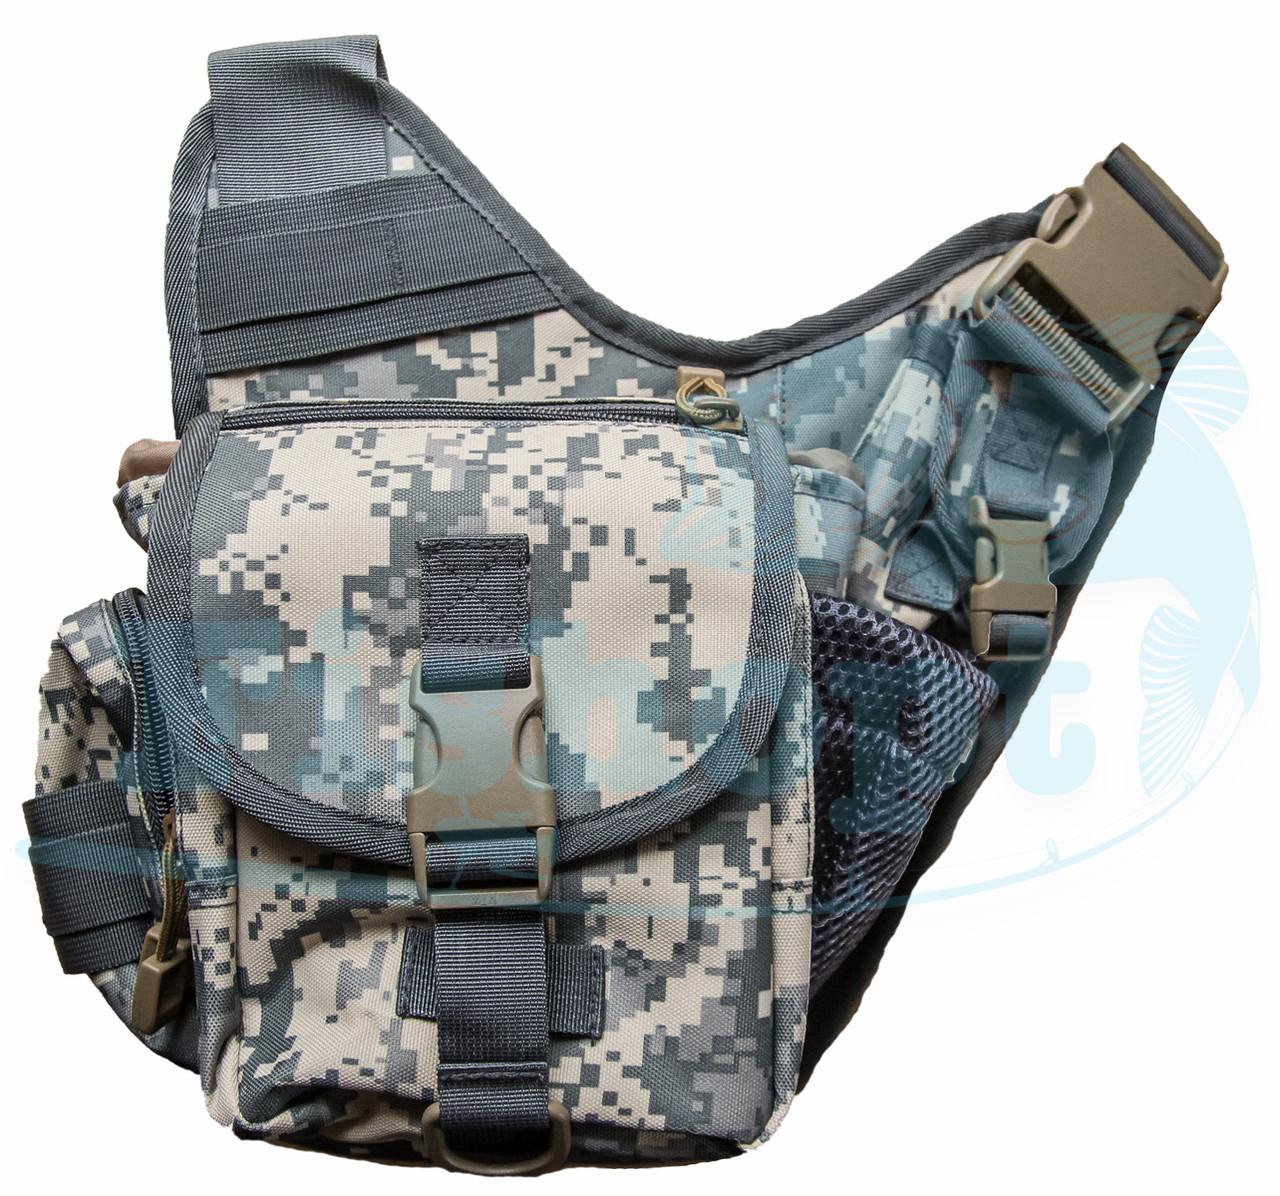 Сумка - рюкзак через плечо на защелке Feima